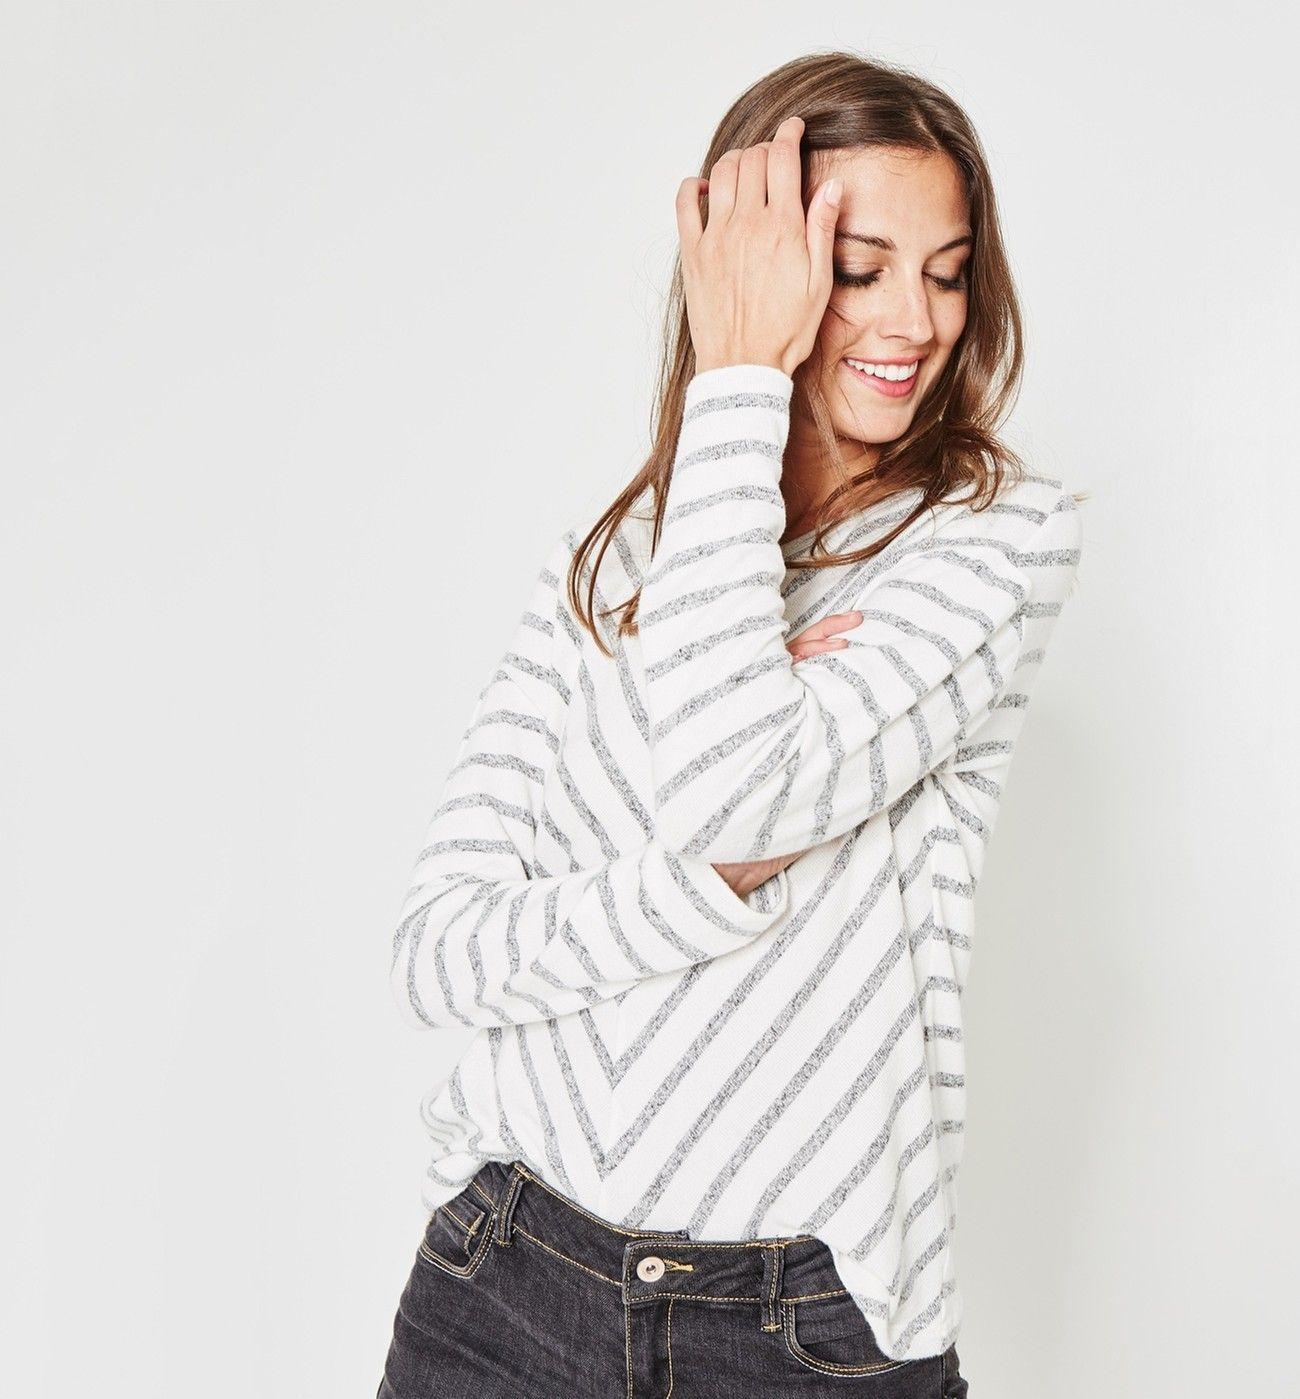 T-shirt rayé Femme - Rayé écru - Tops   T-shirts - Femme - Promod ... 2345f44c706